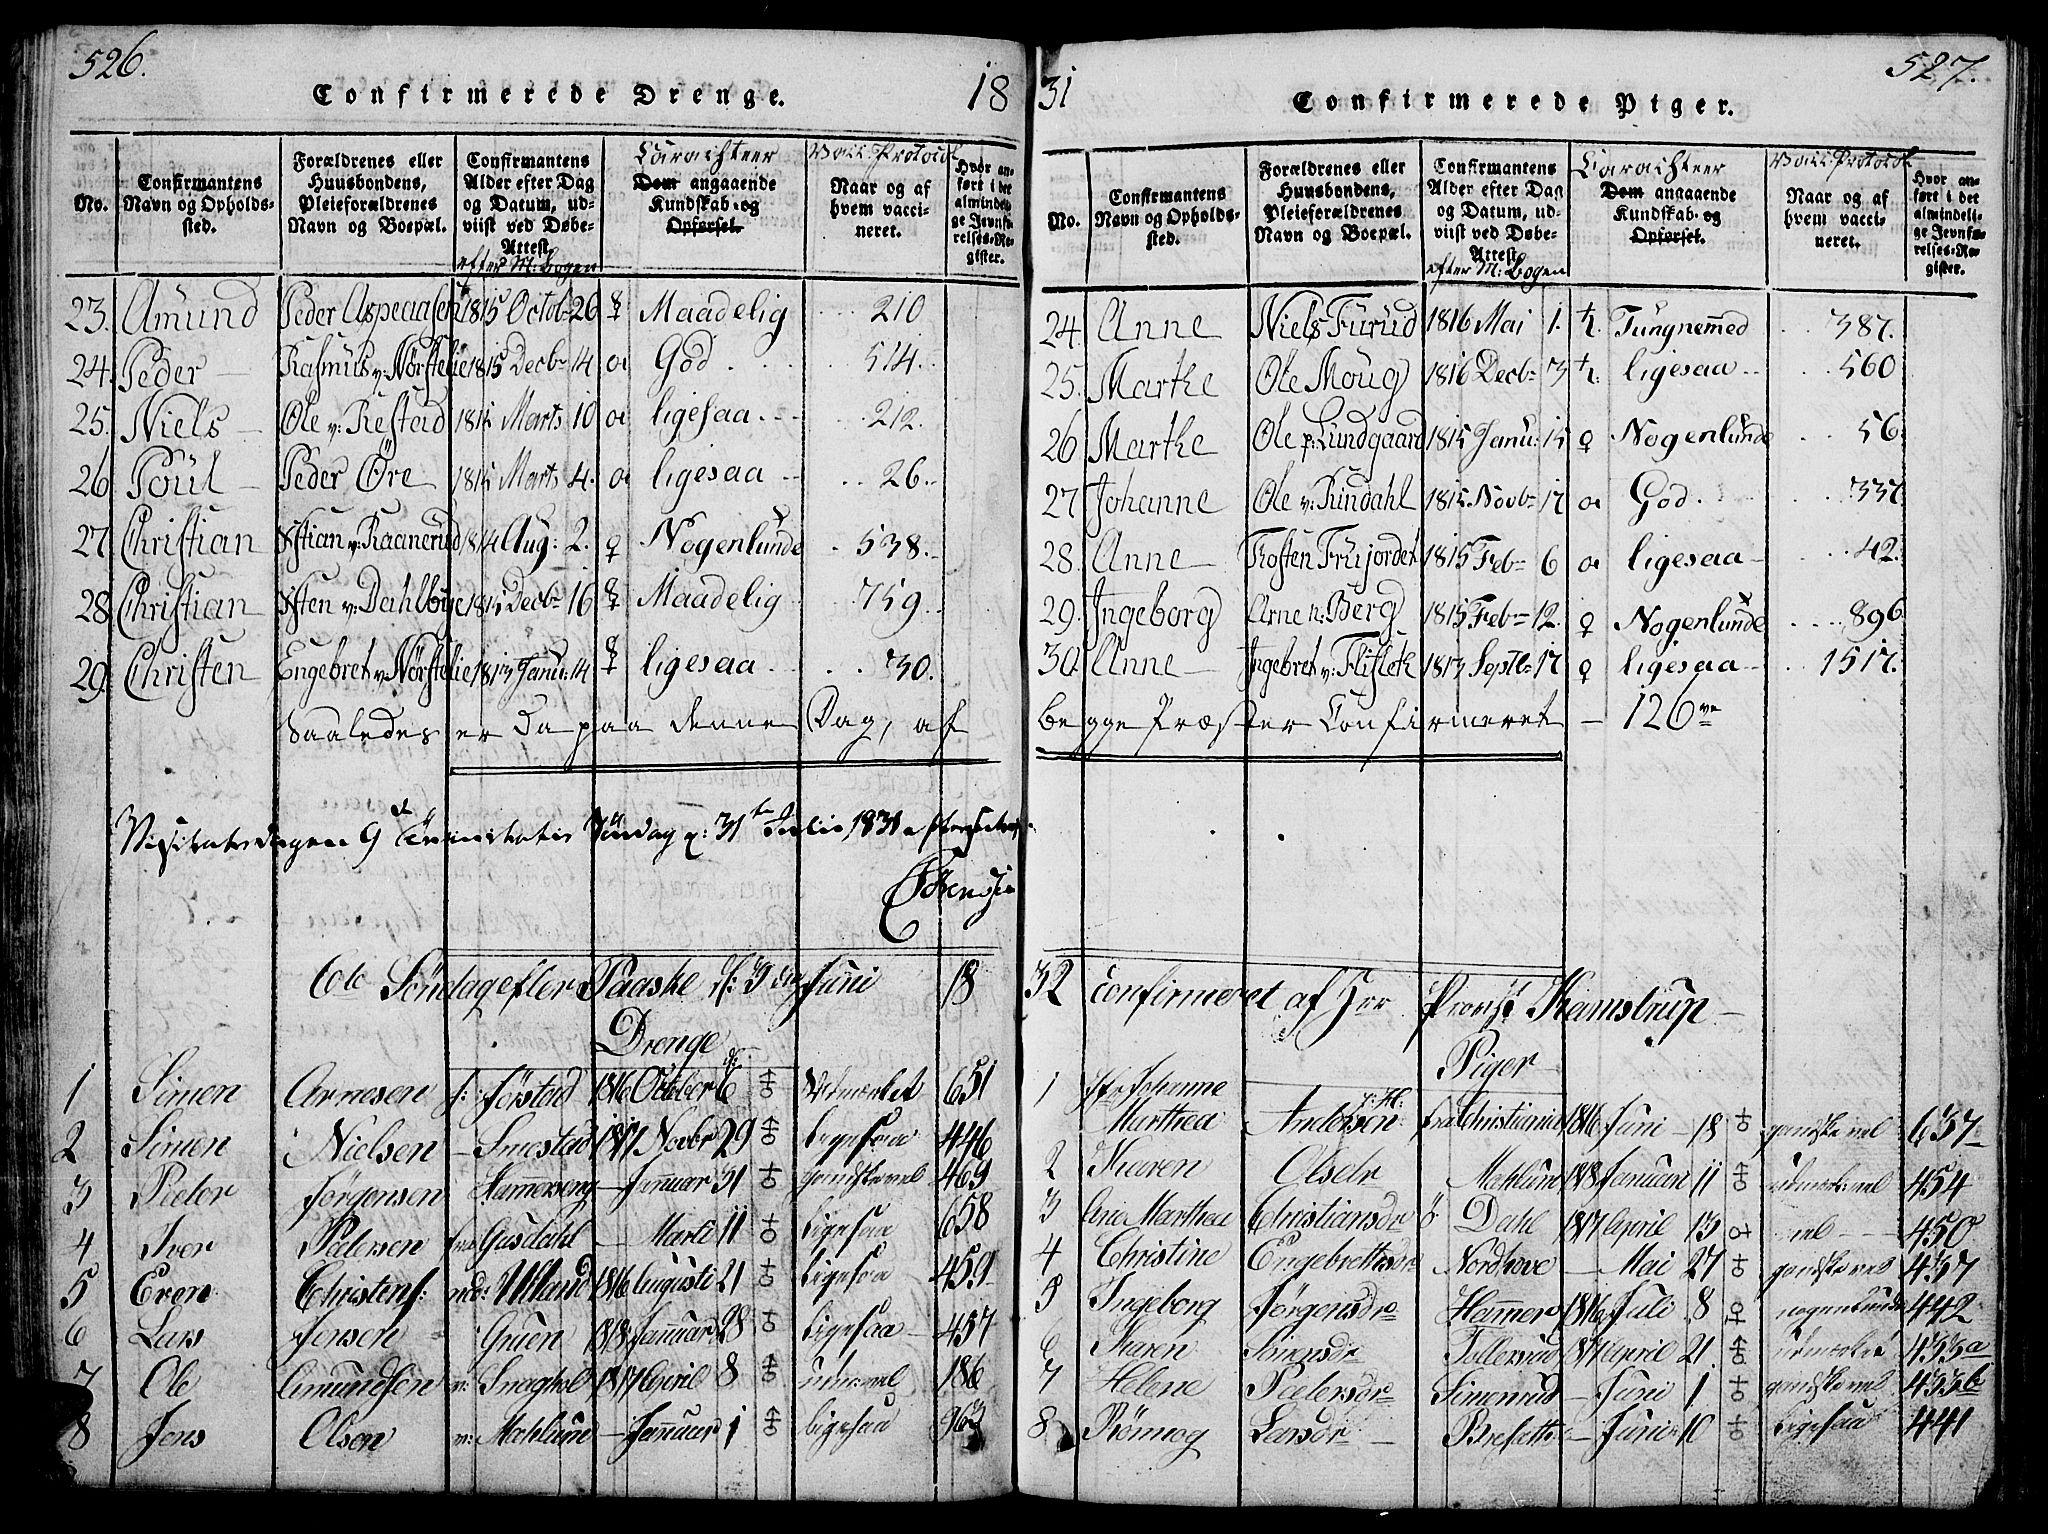 SAH, Fåberg prestekontor, Klokkerbok nr. 4, 1818-1837, s. 526-527